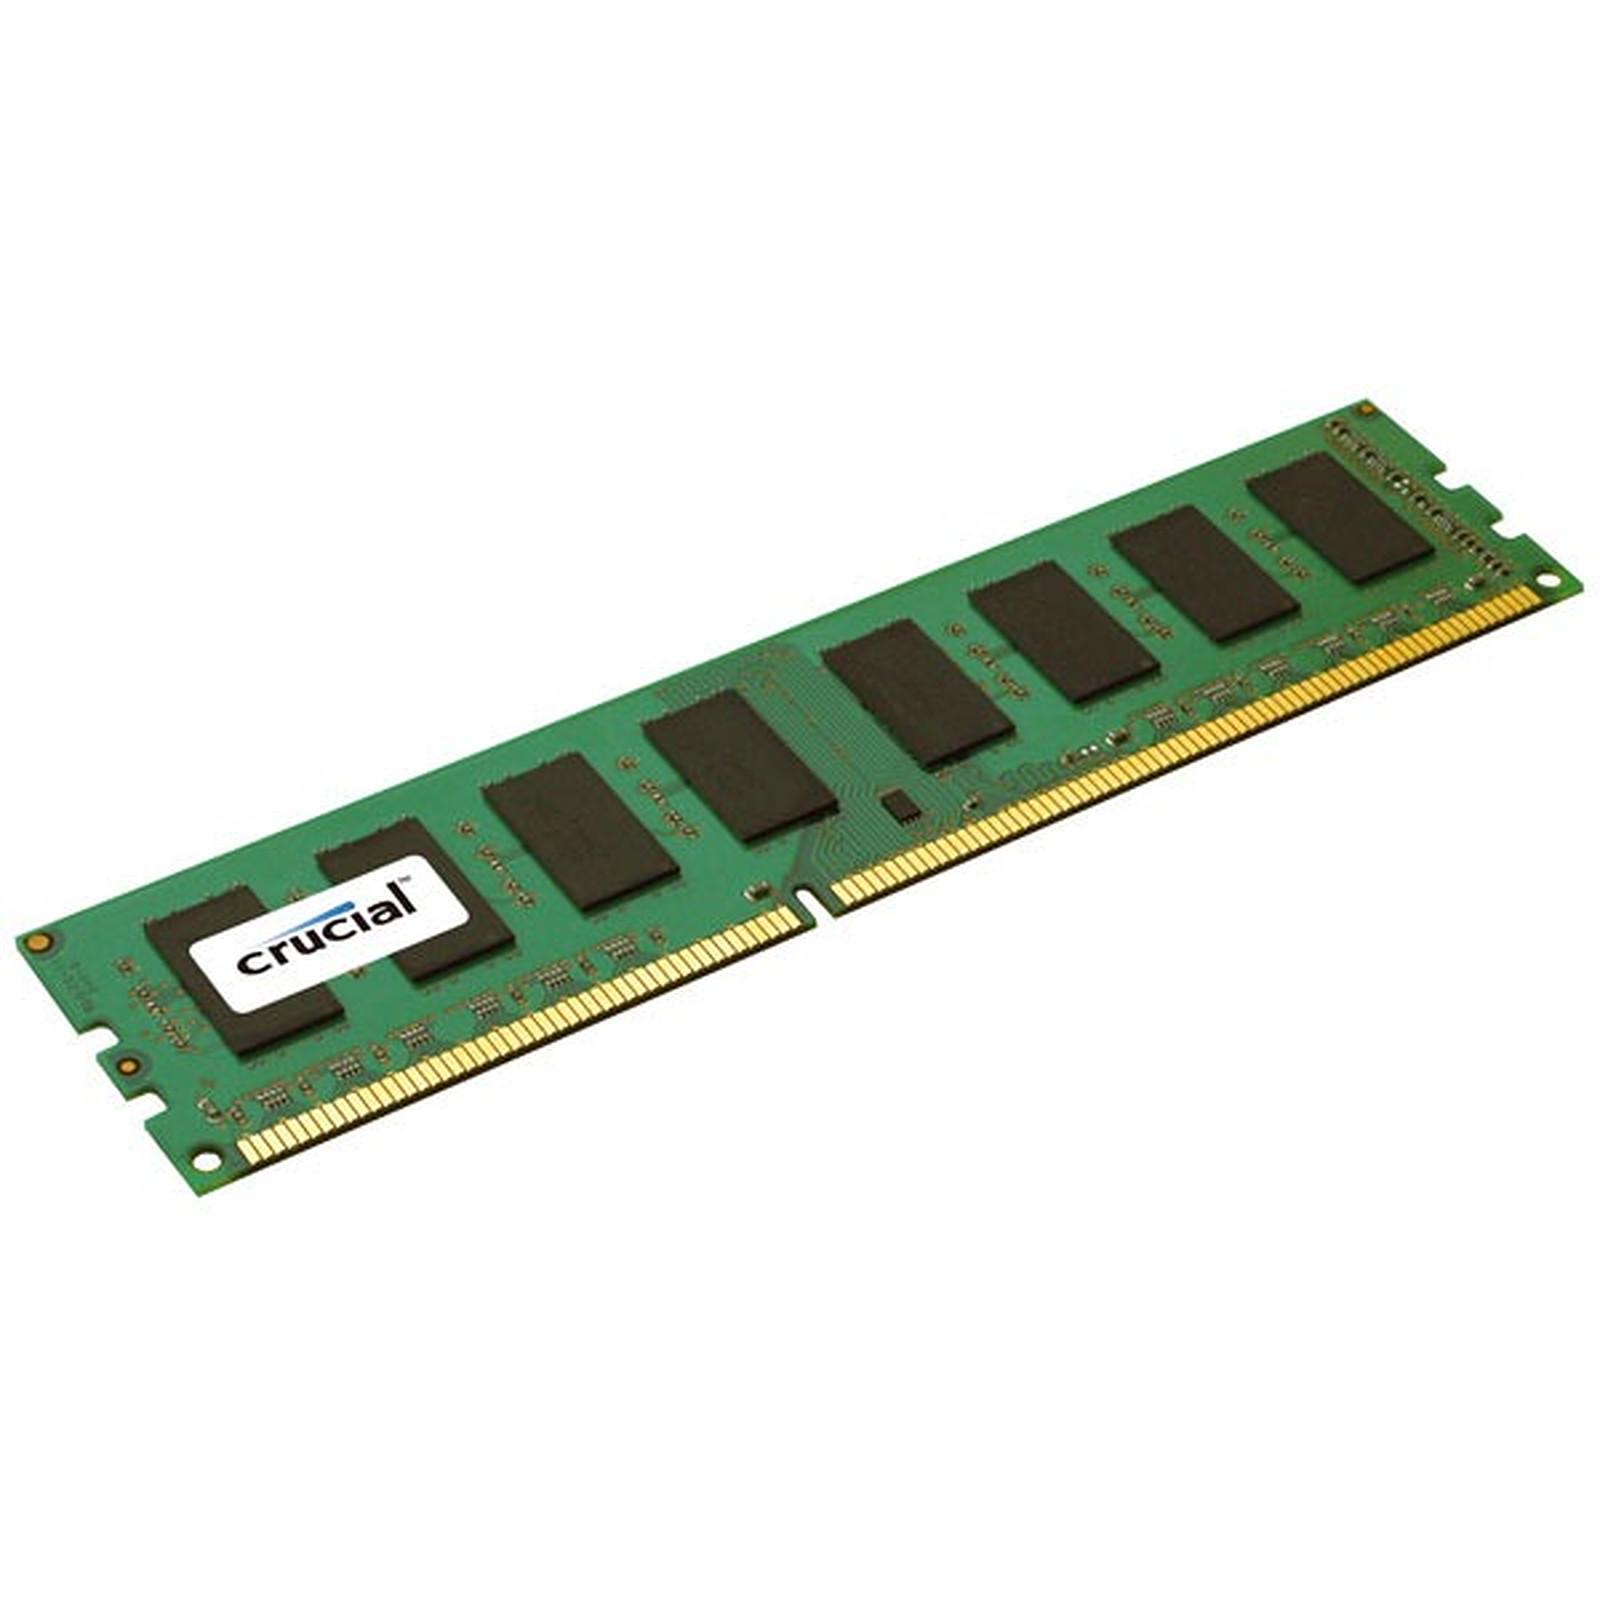 Crucial 8 Go DDR3 1600 MHz CL11